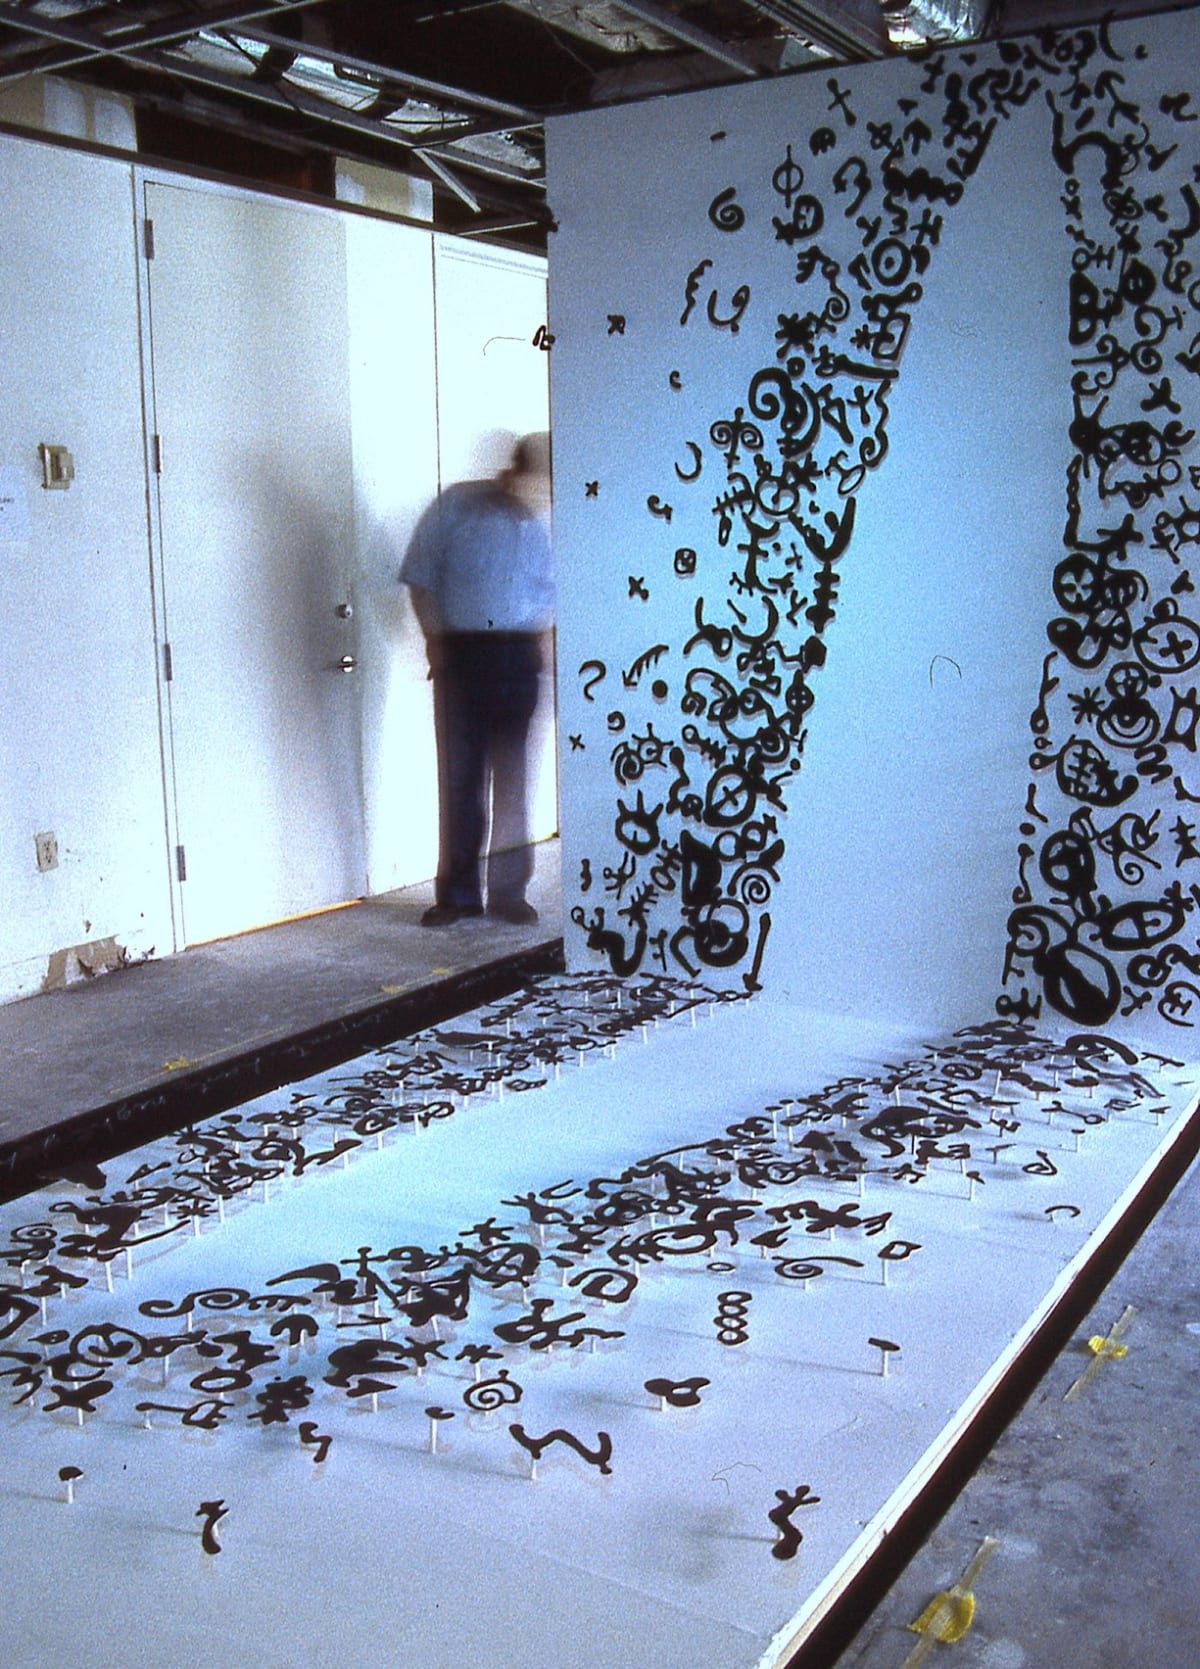 1999 Carlos Betancourt Departing Perspectives Exhibit00100